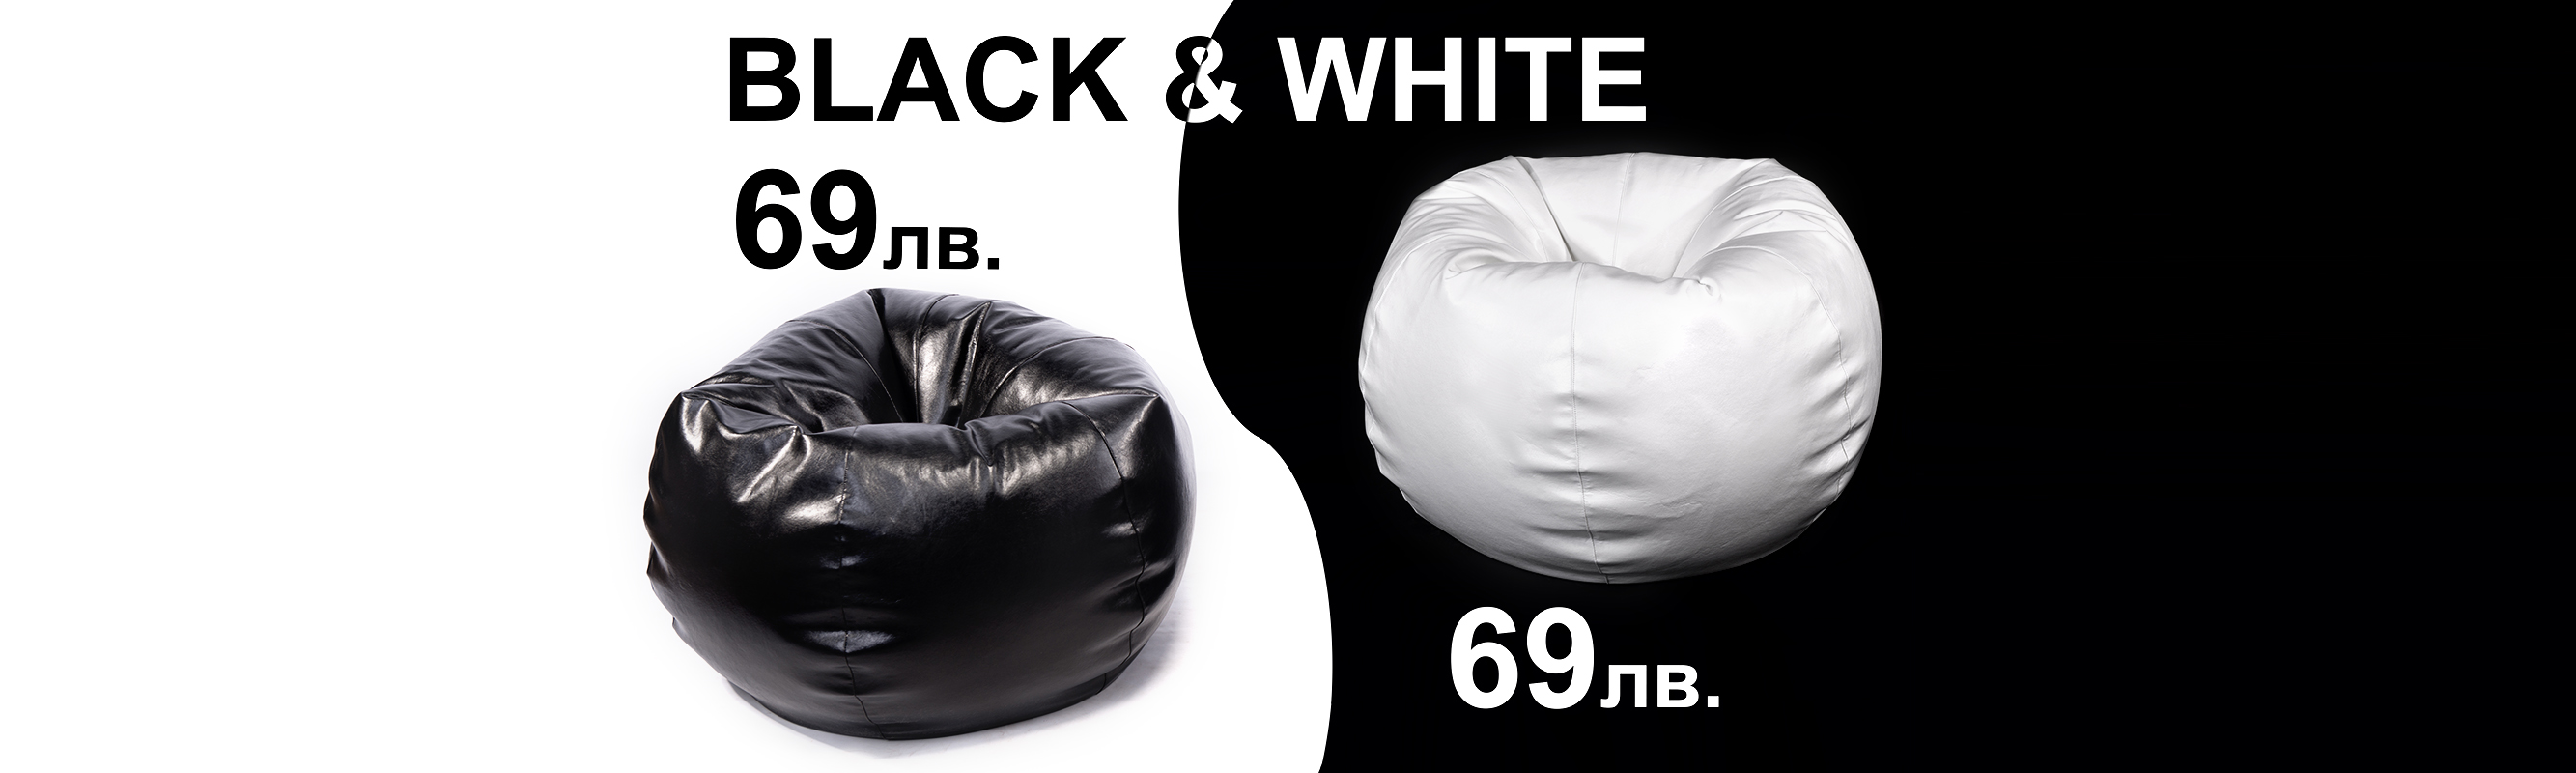 ПРОМОЦИЯ   BLACK & WHITE